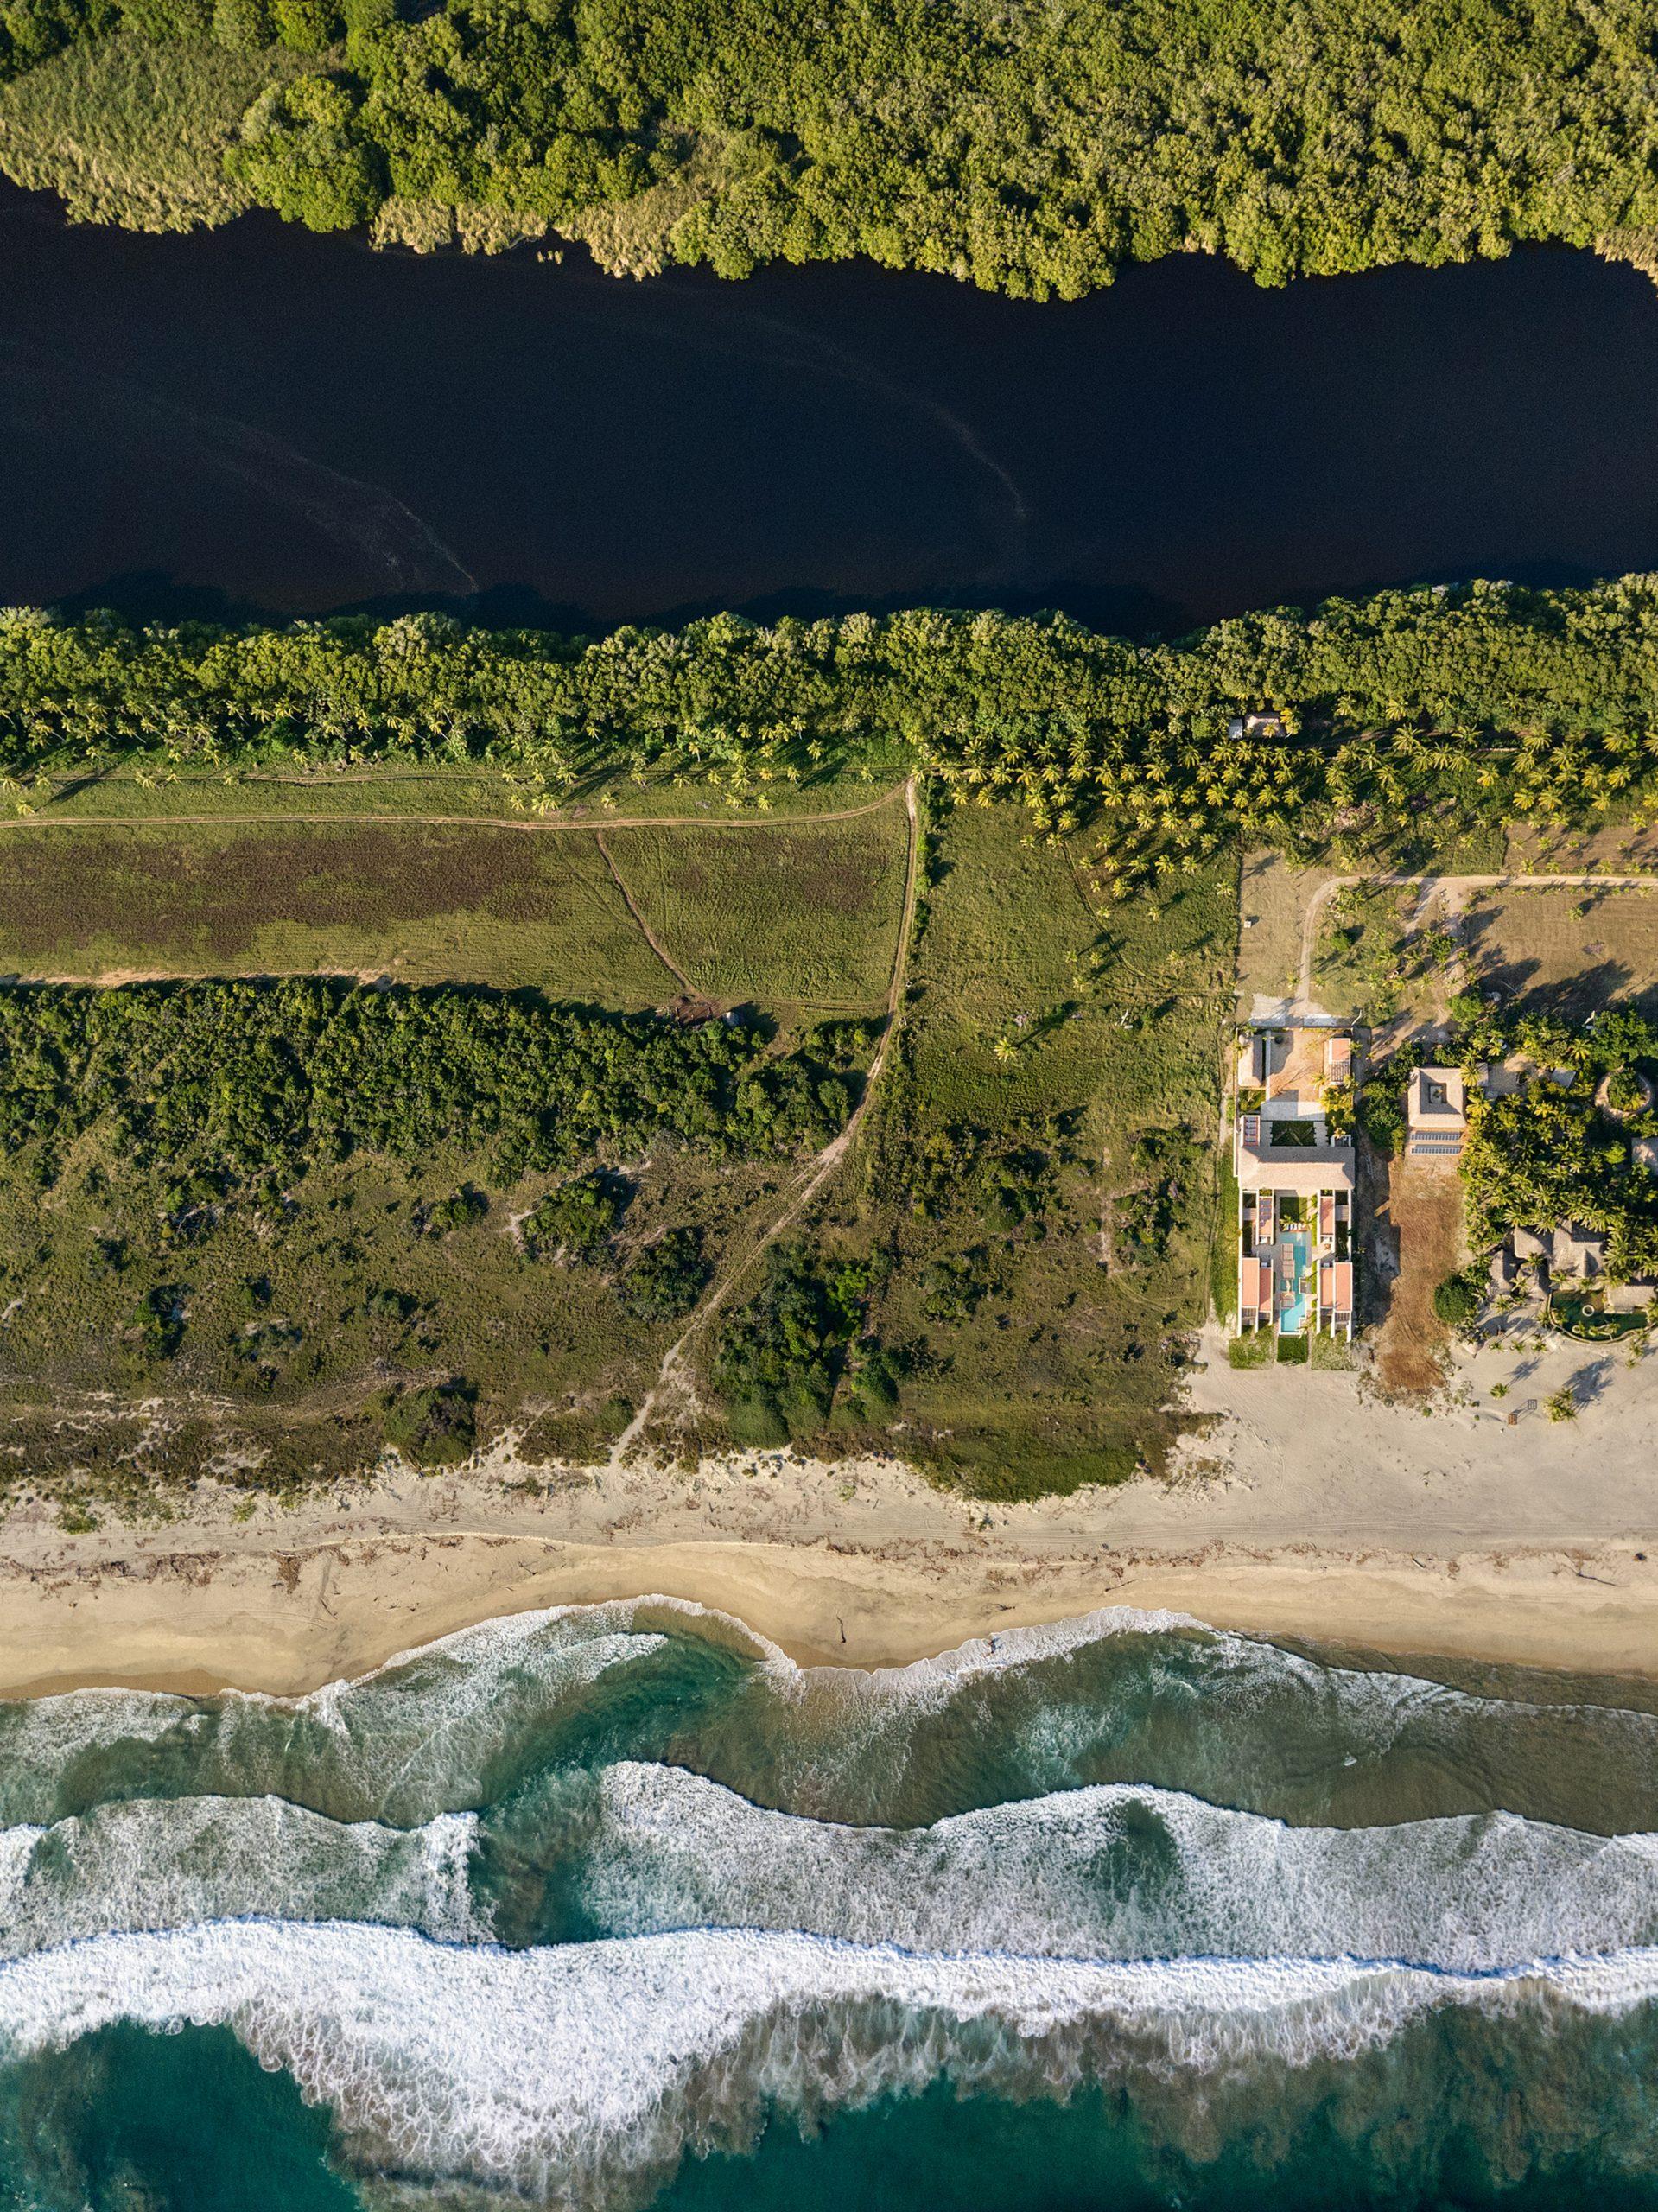 An aerial view of Casa Cova's setting